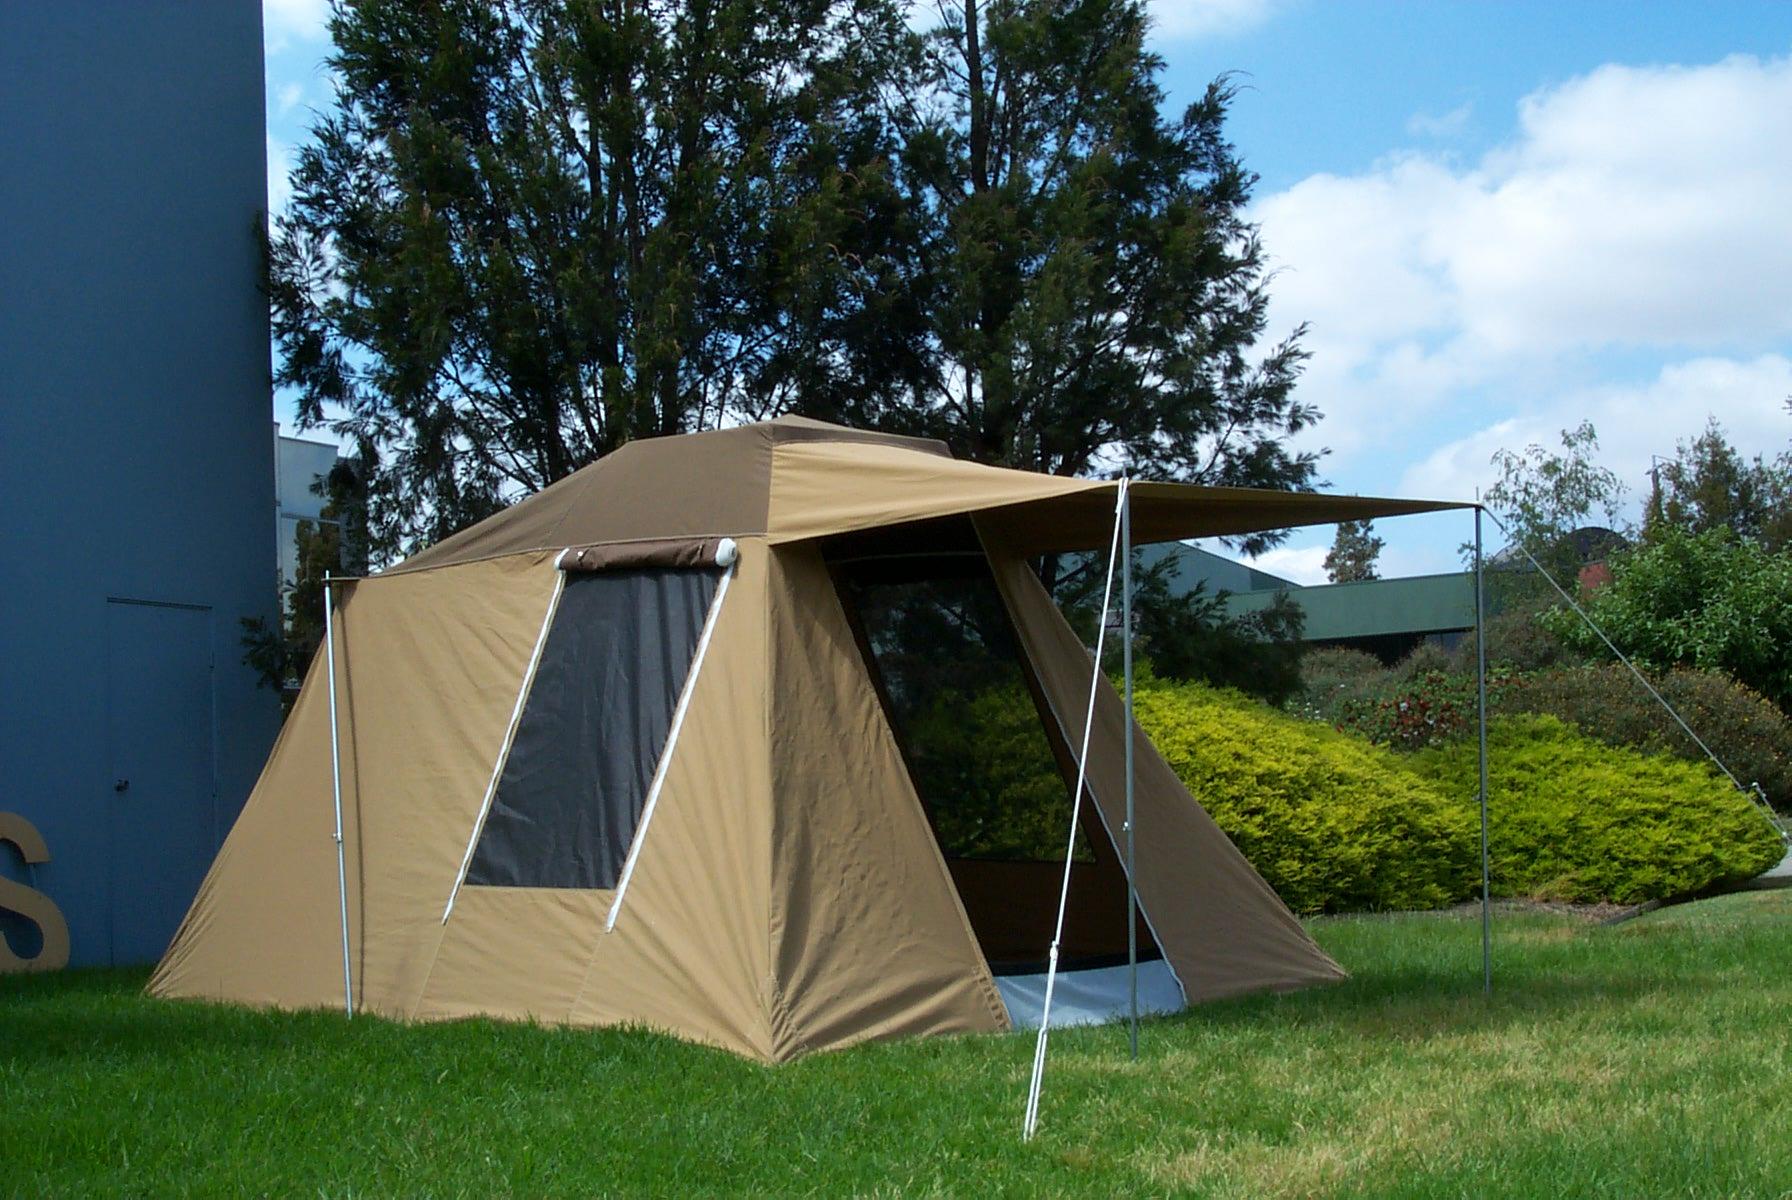 Gazebos Australia Best Accessories Heavy Duty Oztrail Tent Inner Kit & Best Canvas Tents In Australia - Best Tent 2018